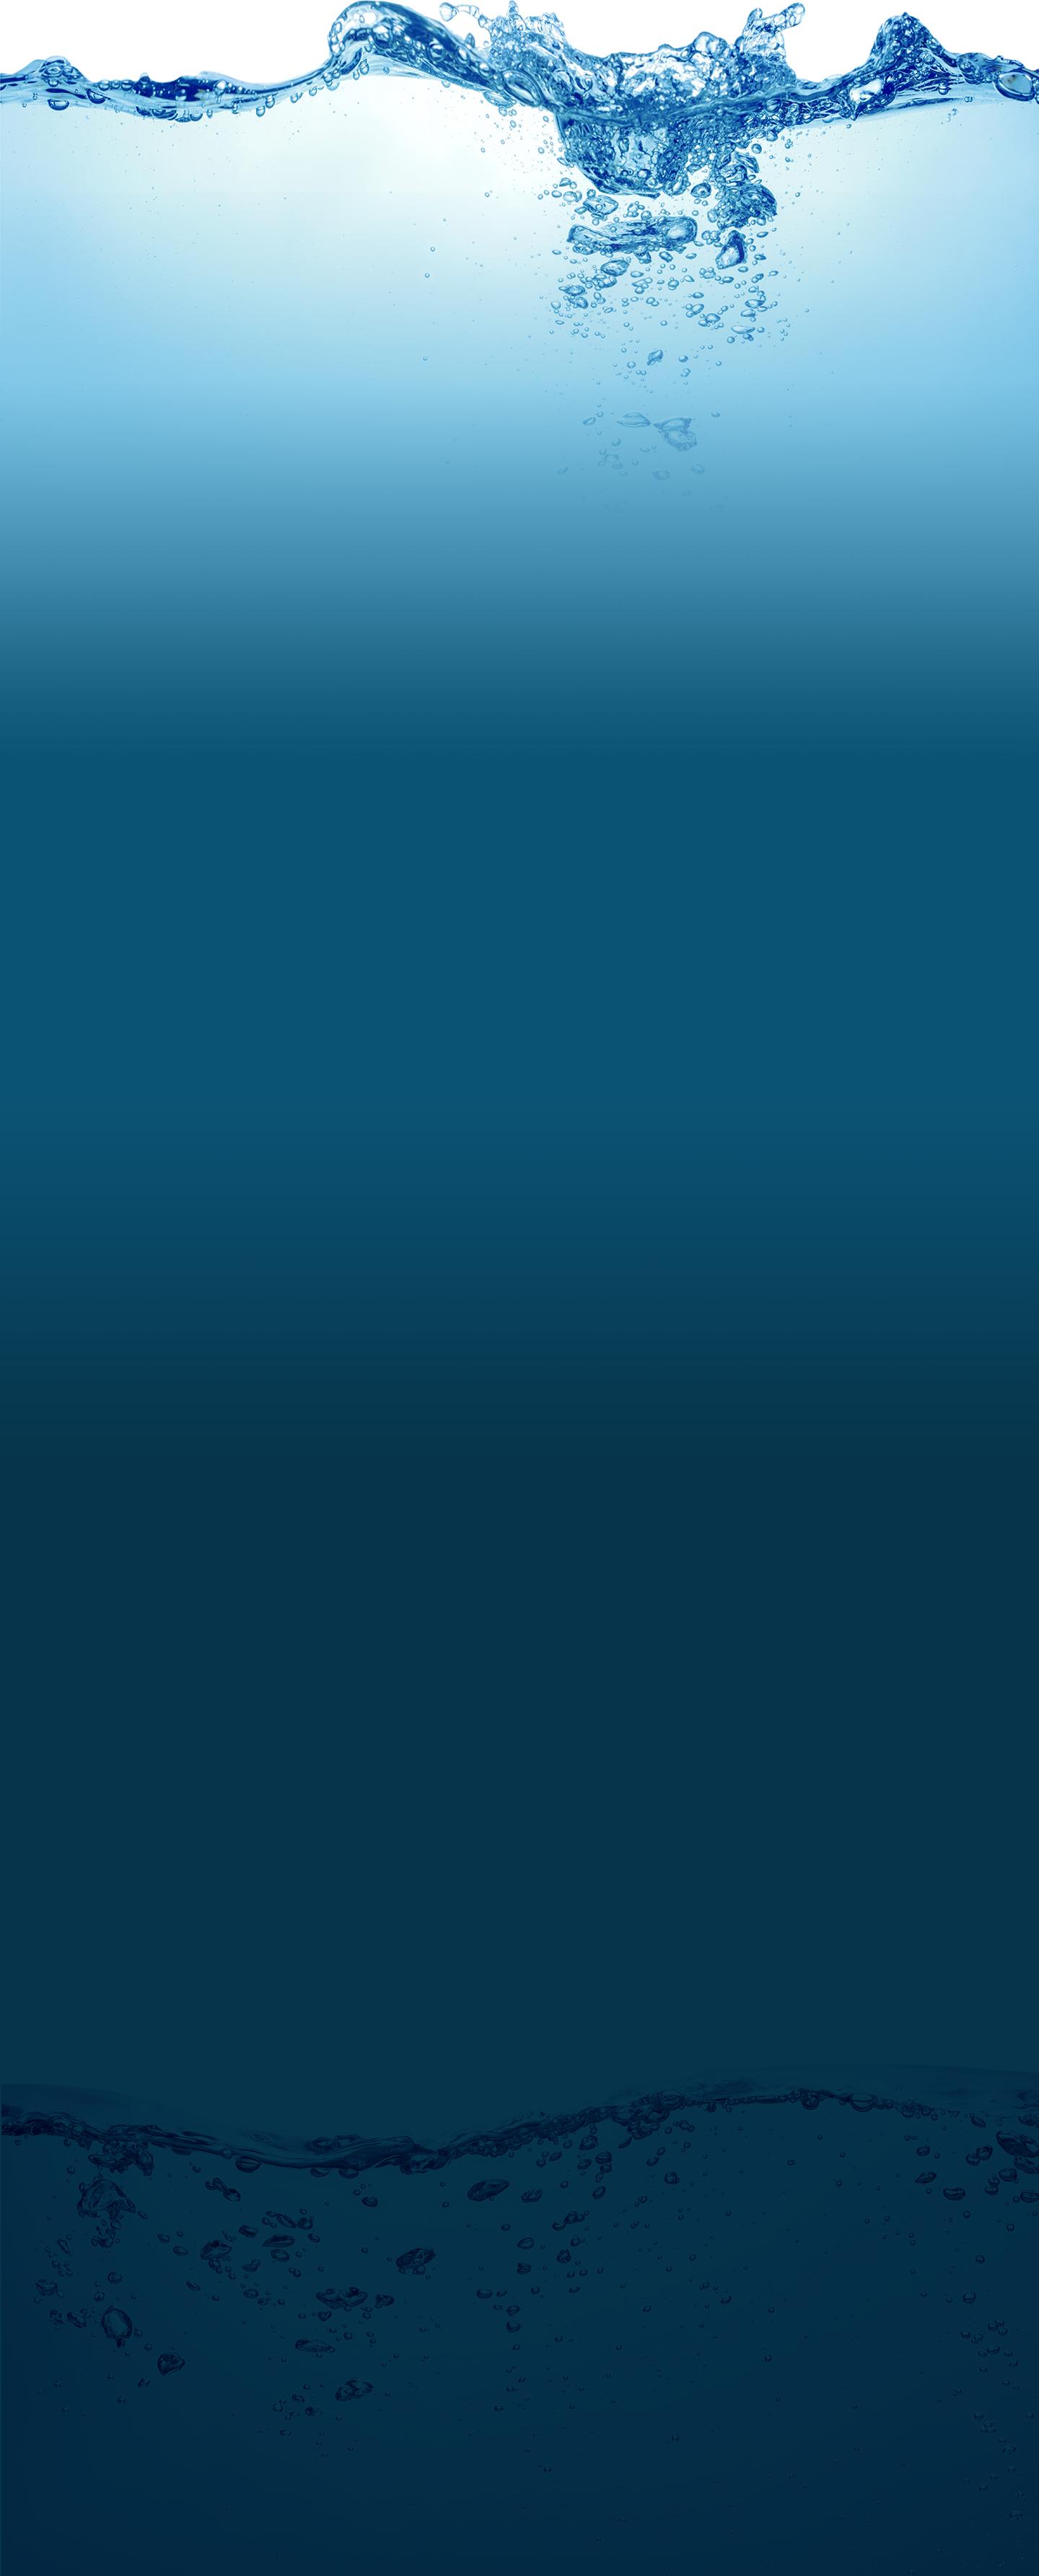 iconn_bg1